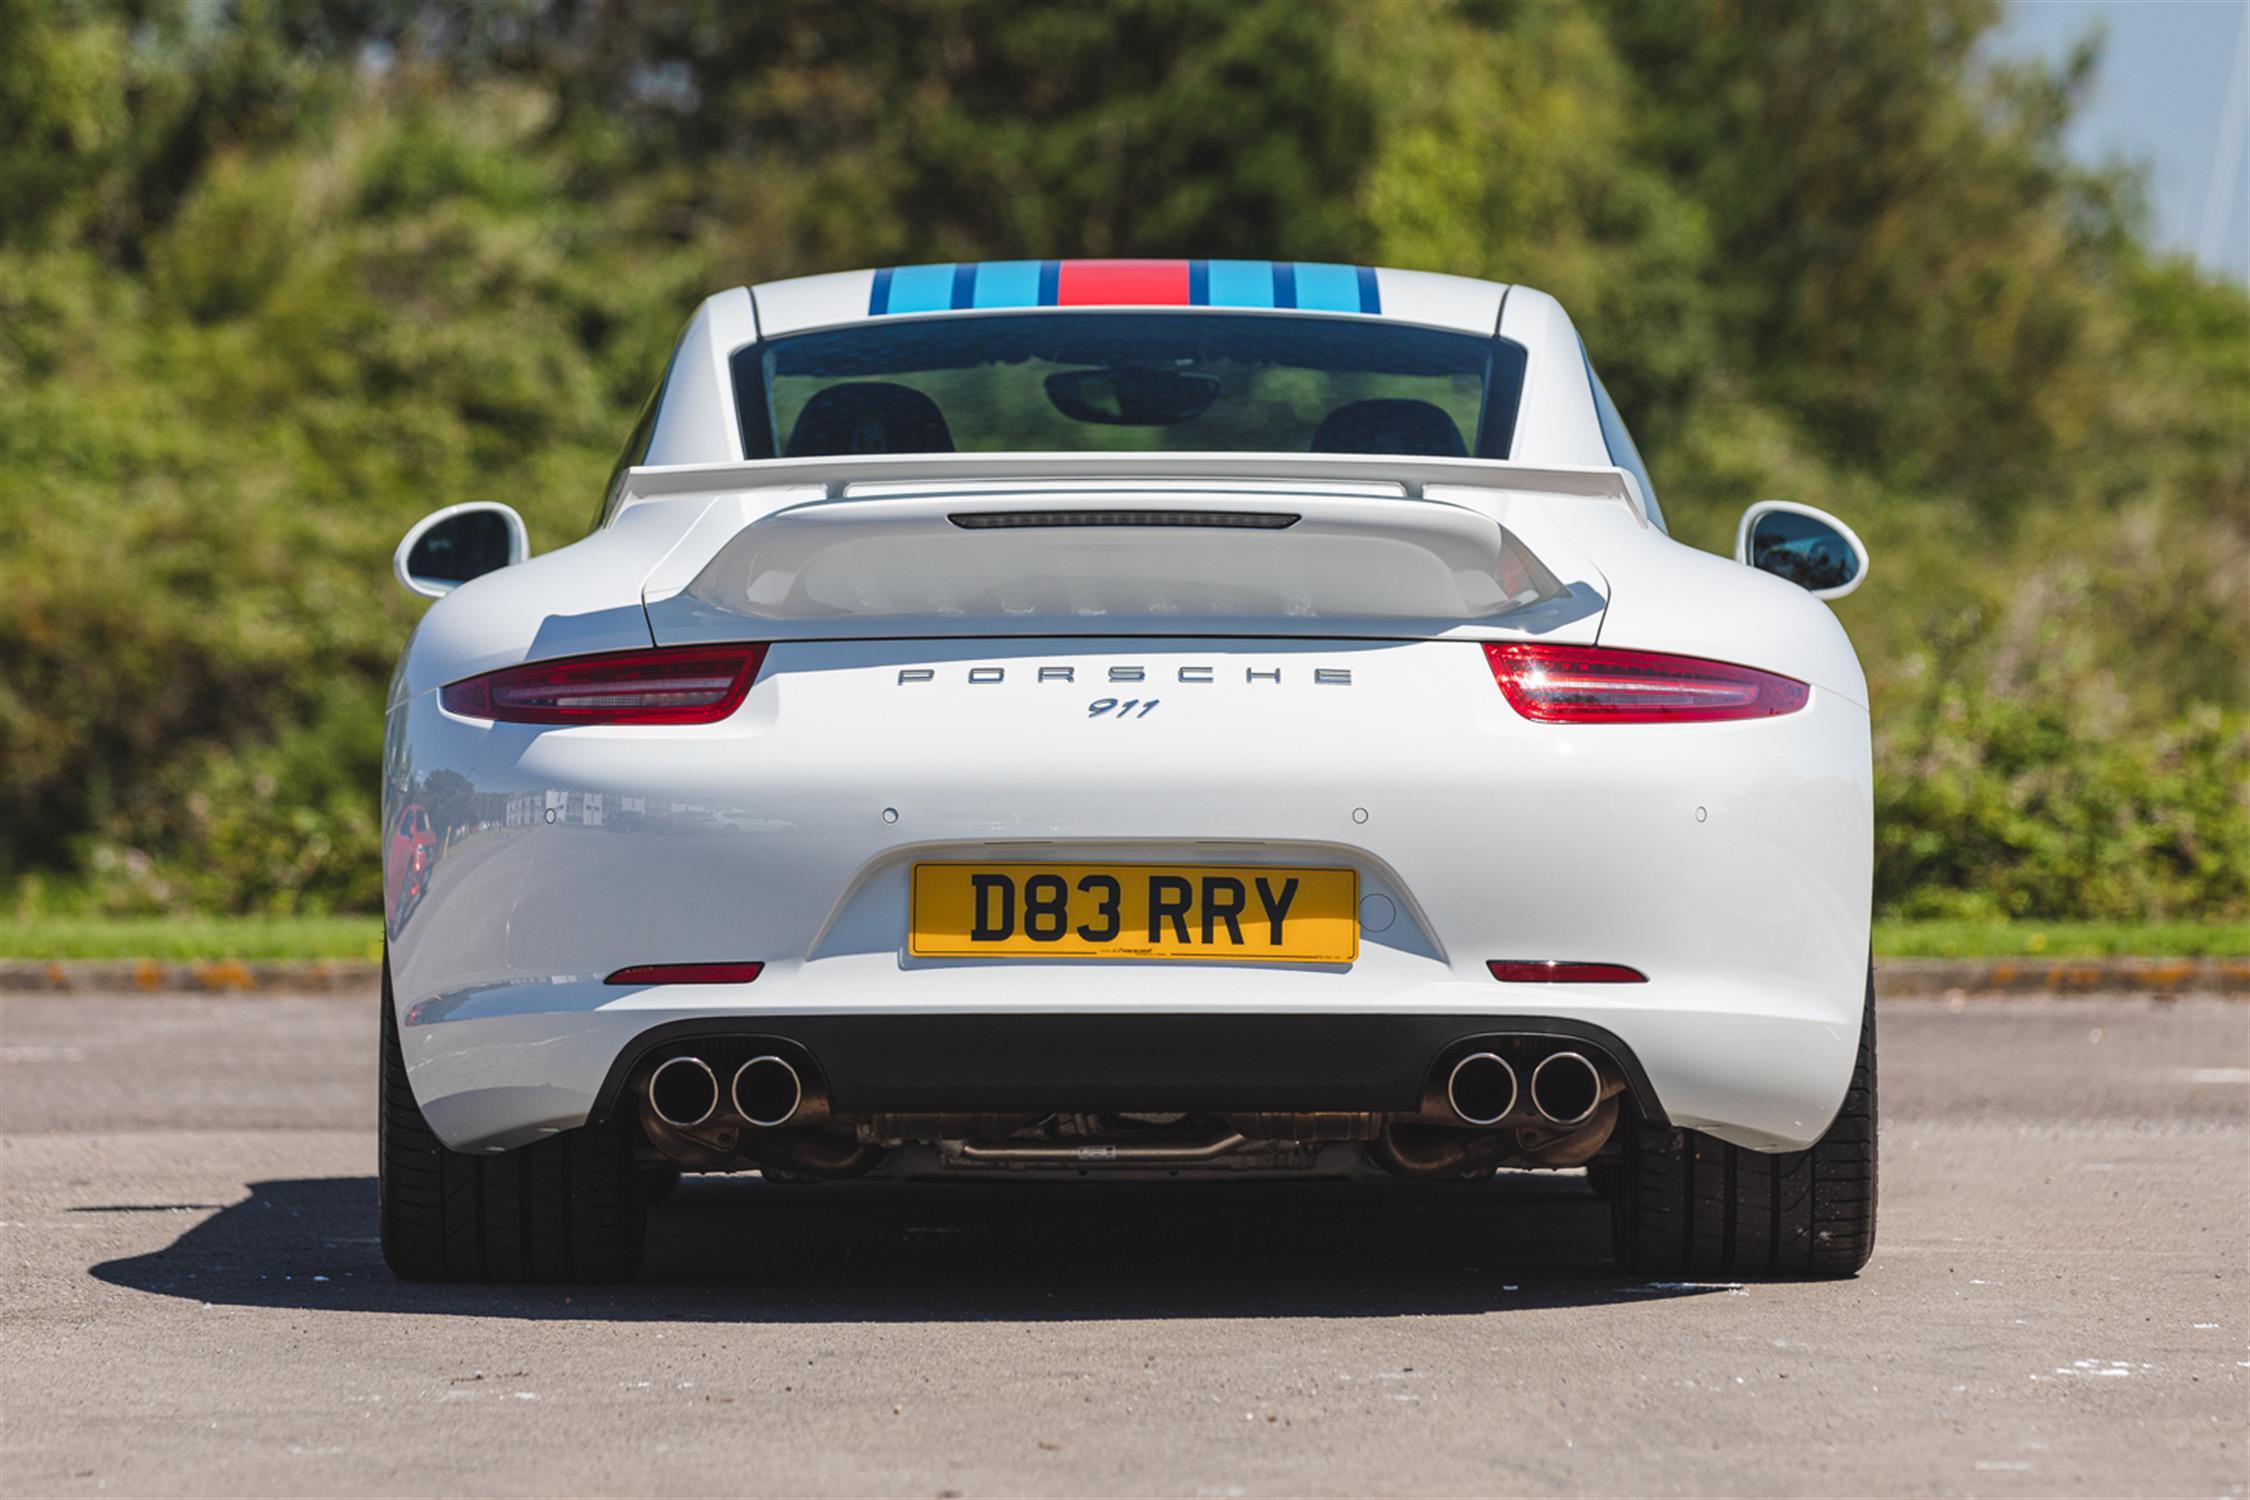 2014 Porsche 911 (991) 3.8 Martini Racing Edition (RHD) - Image 4 of 10